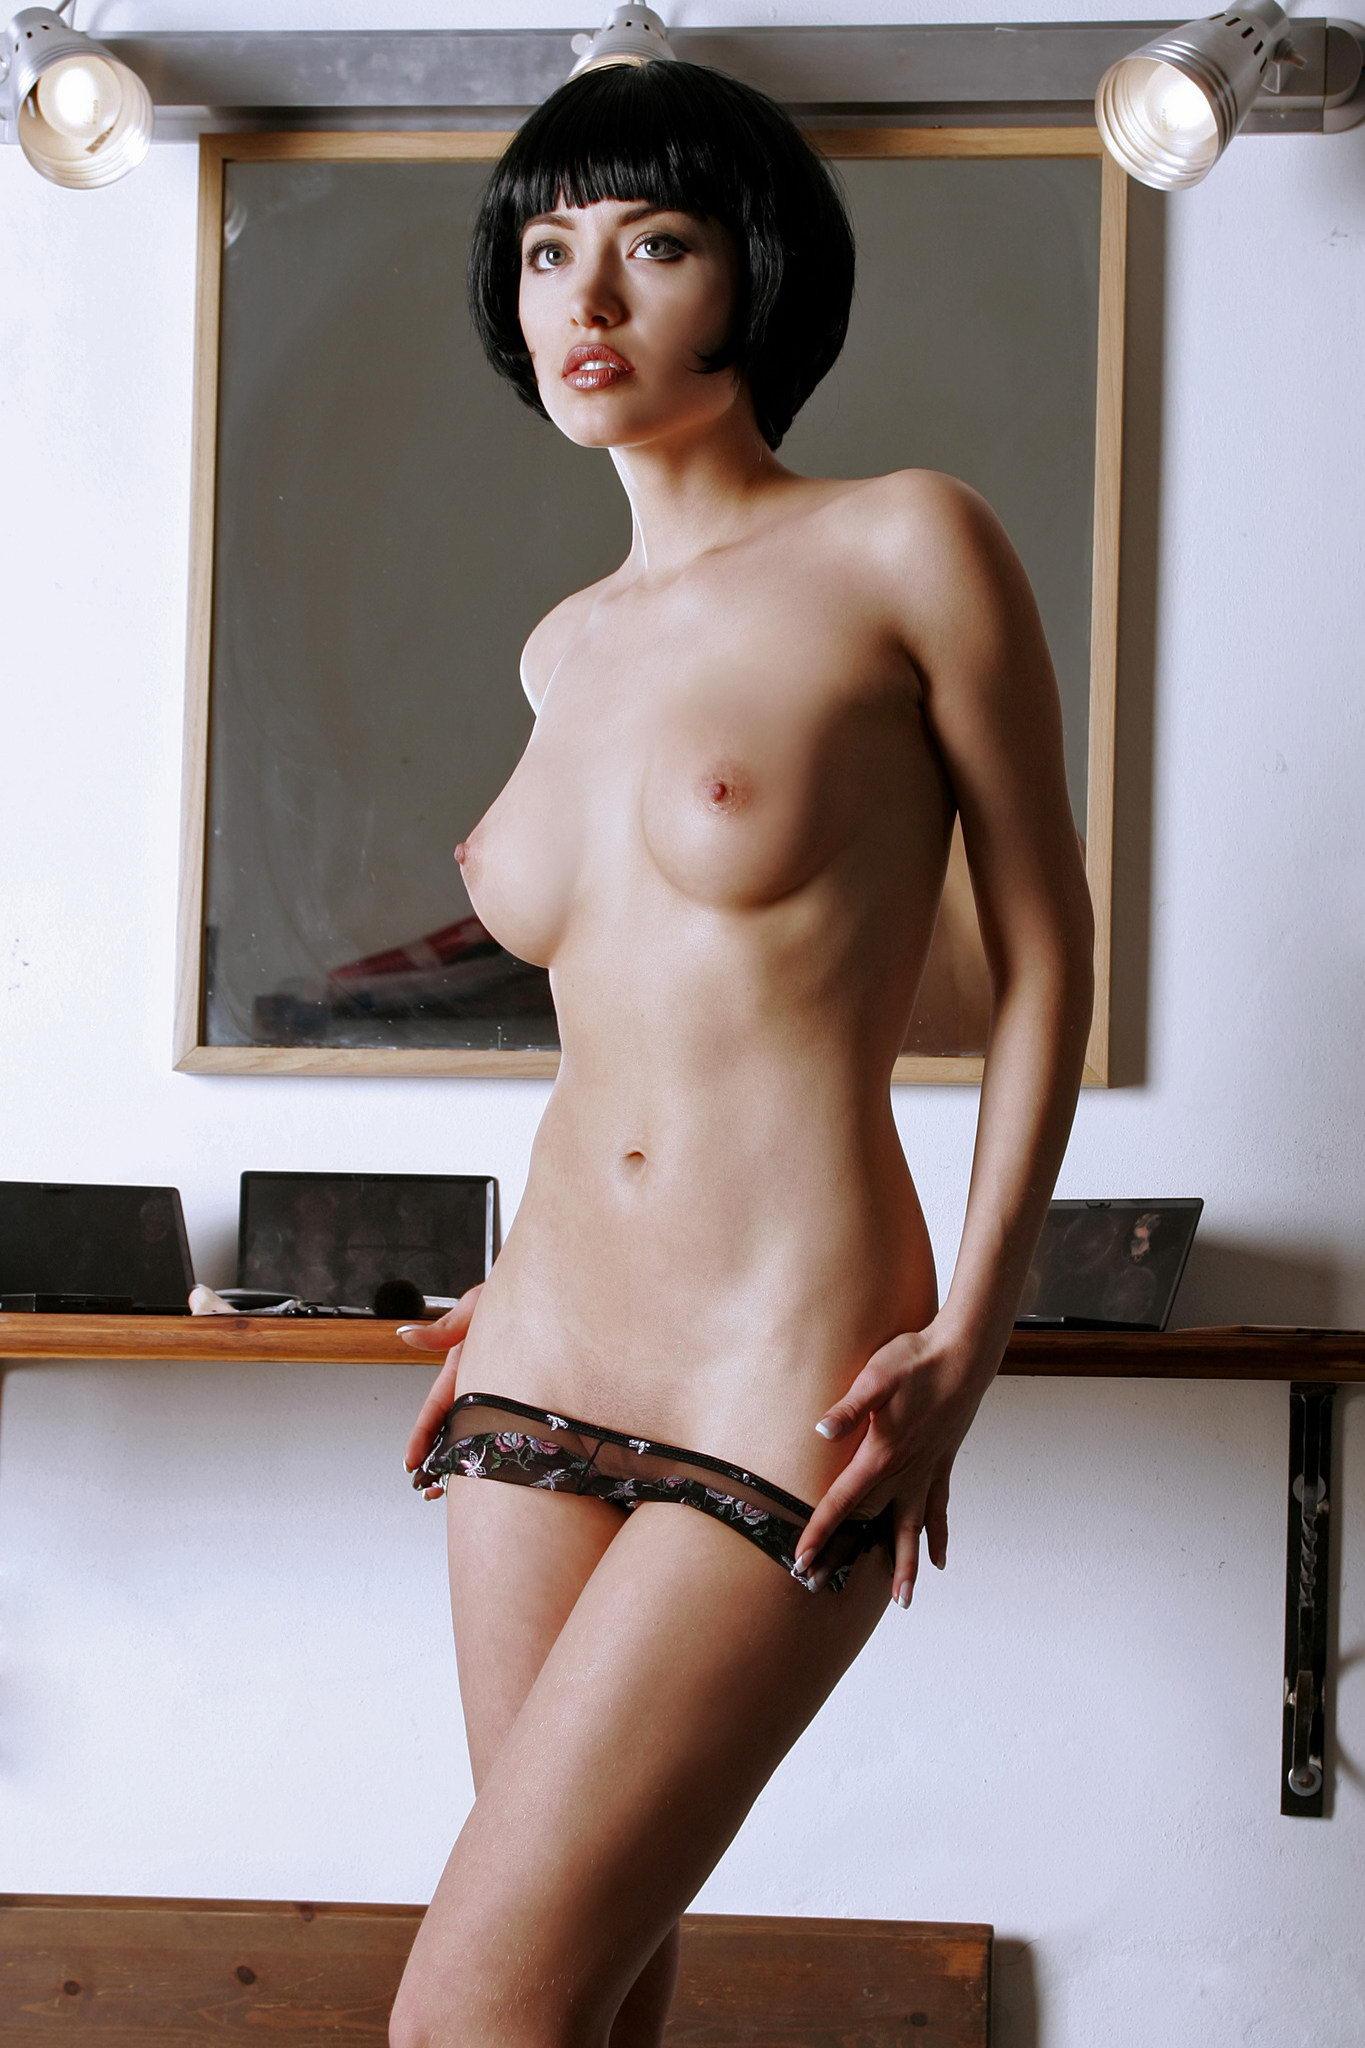 шарик голая девушка с короткими волосами фото ебут